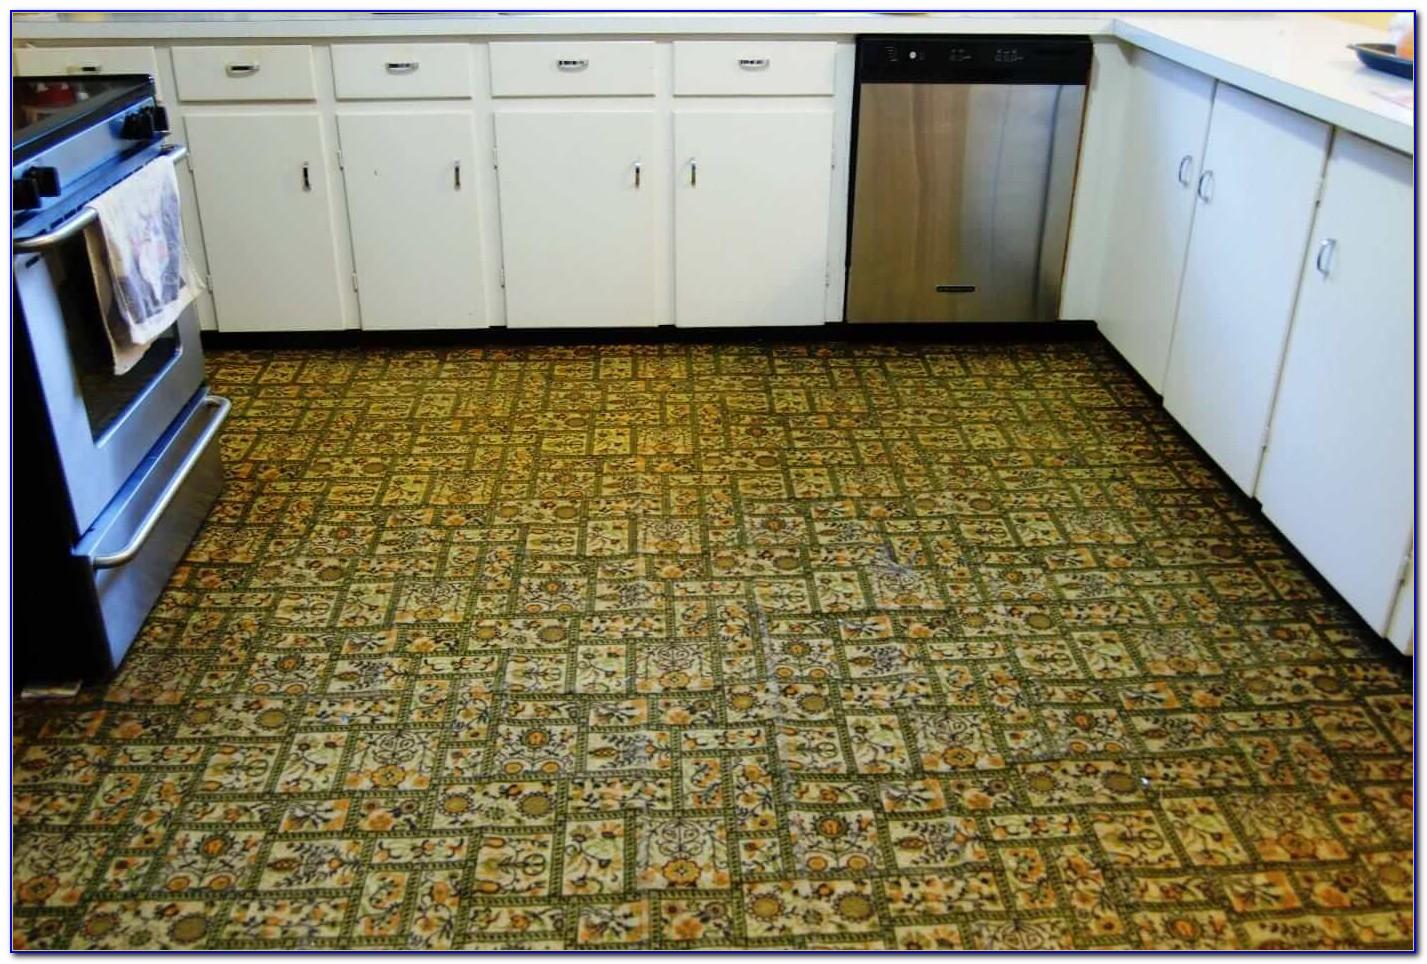 Self Stick Floor Tiles Won't Stick